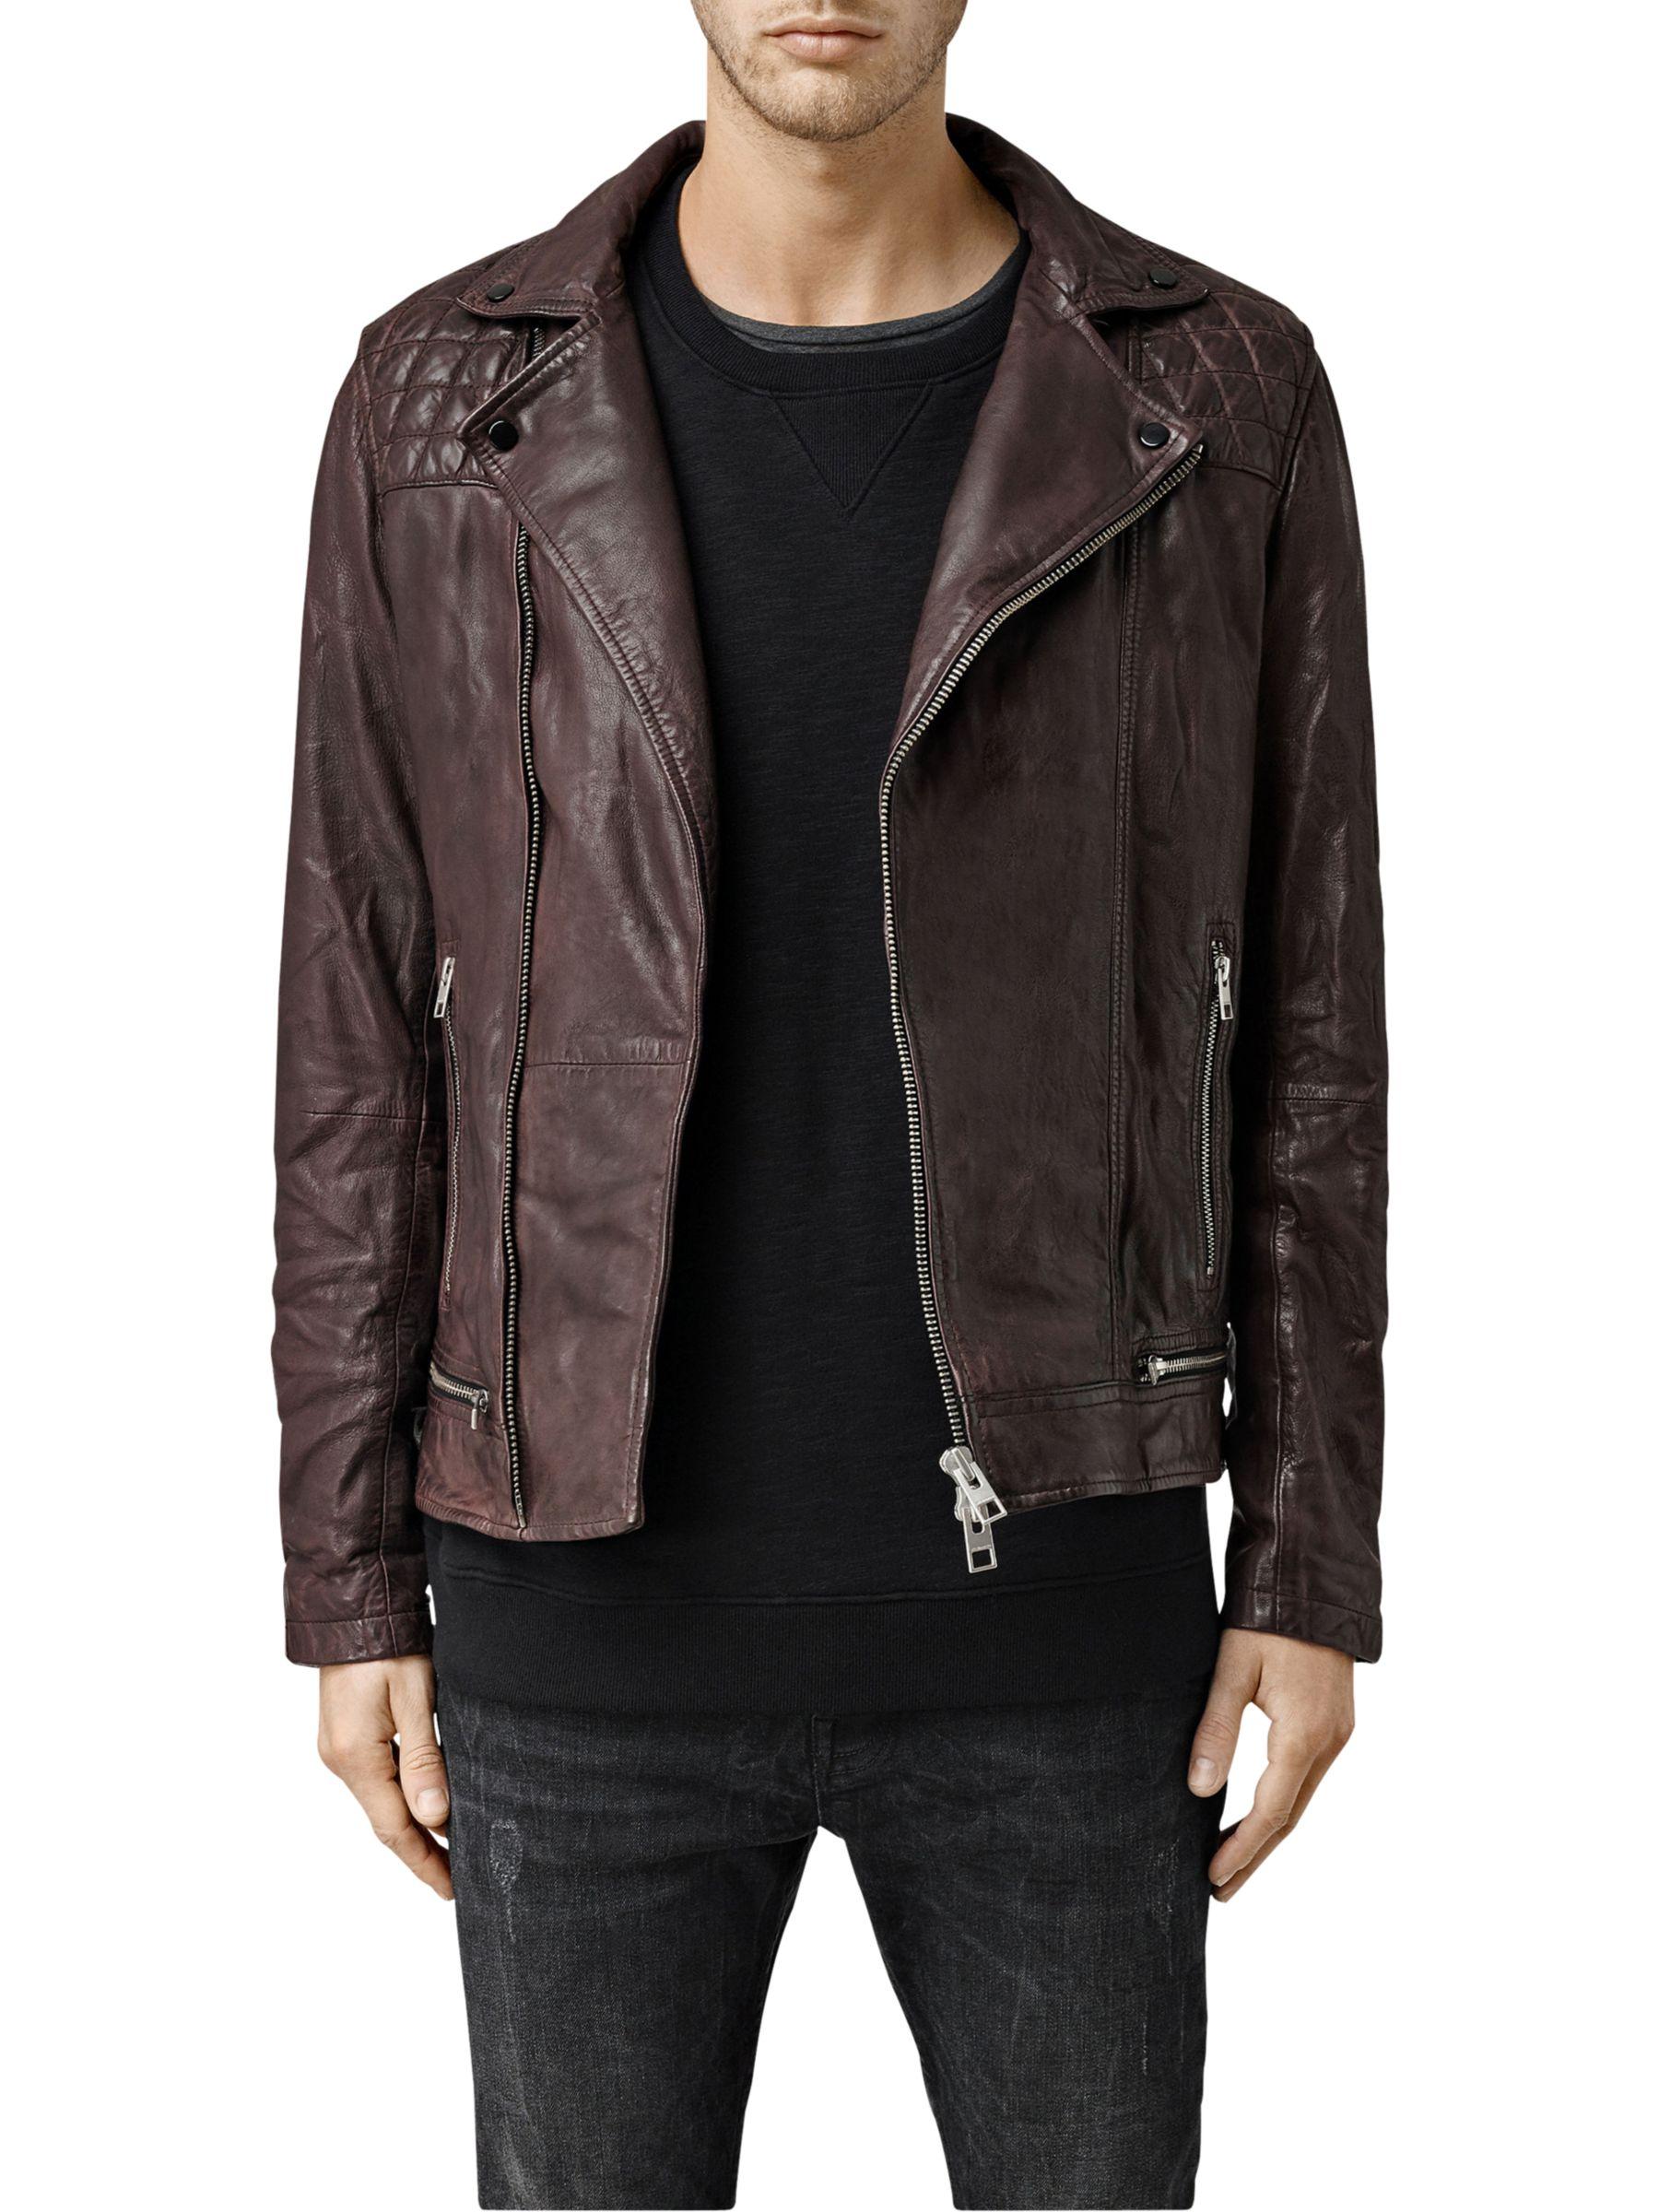 AllSaints Conroy Leather Biker Jacket, Oxblood